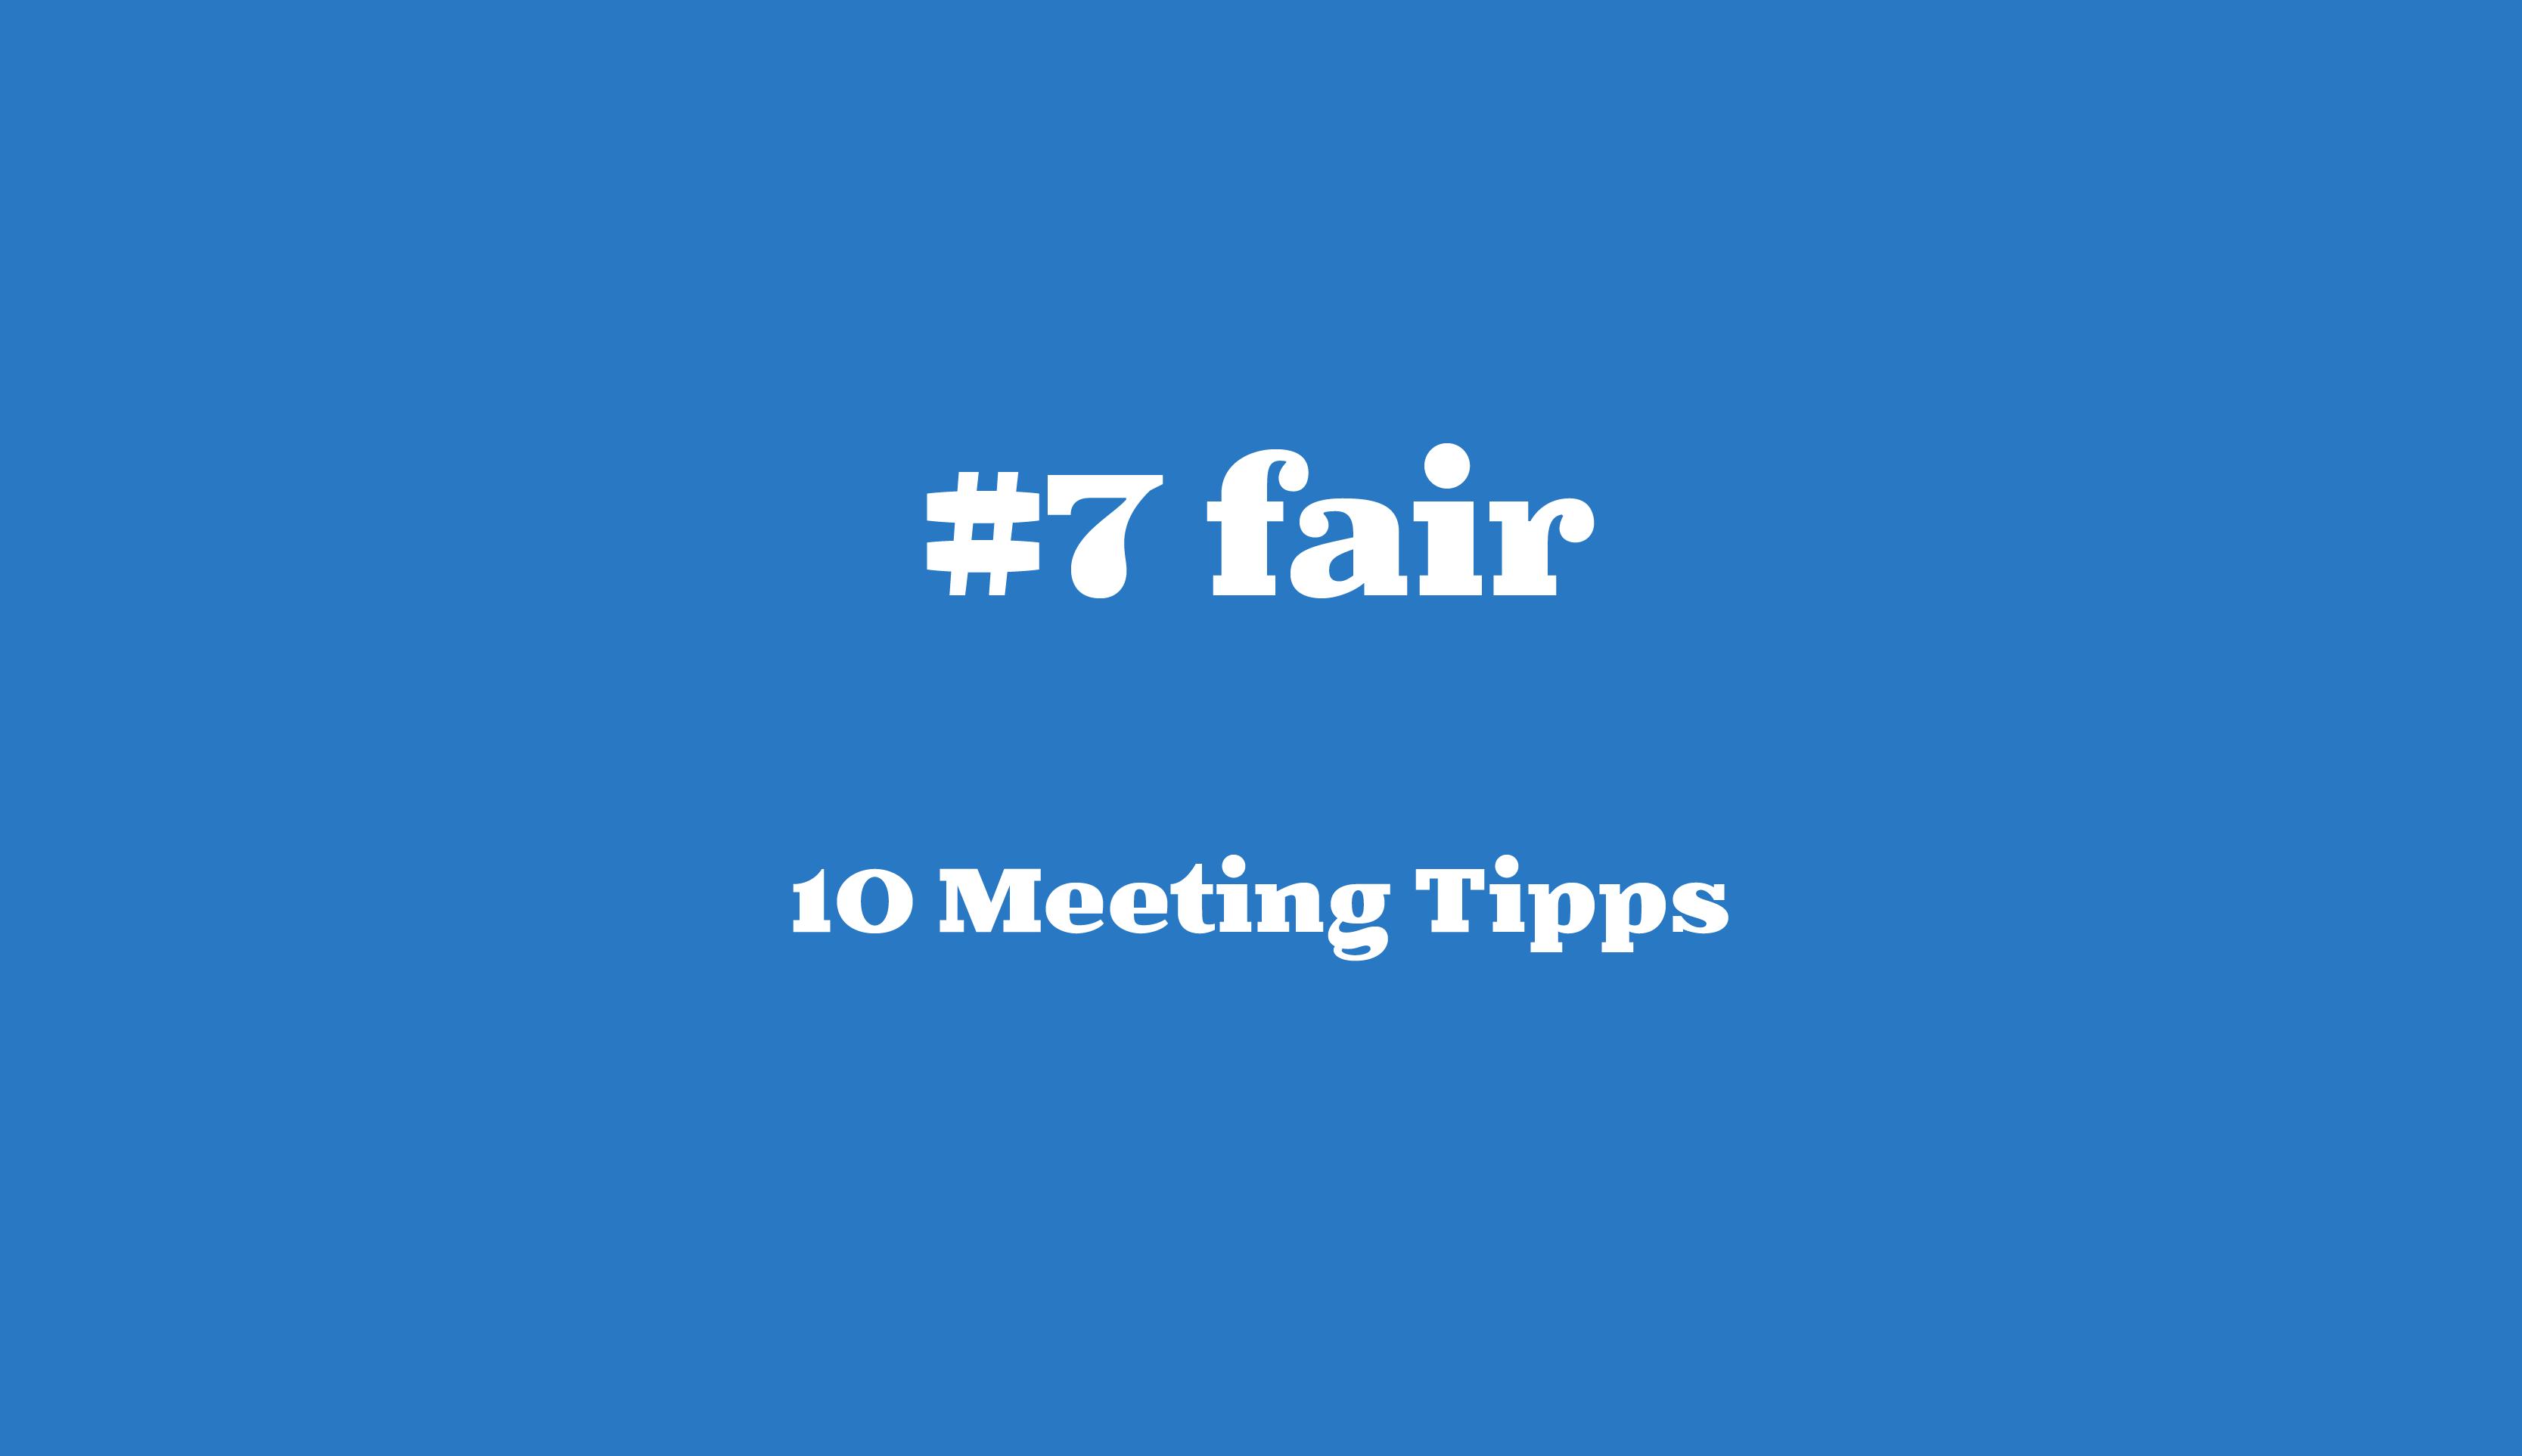 #7 fair // 10 Meeting Tipps